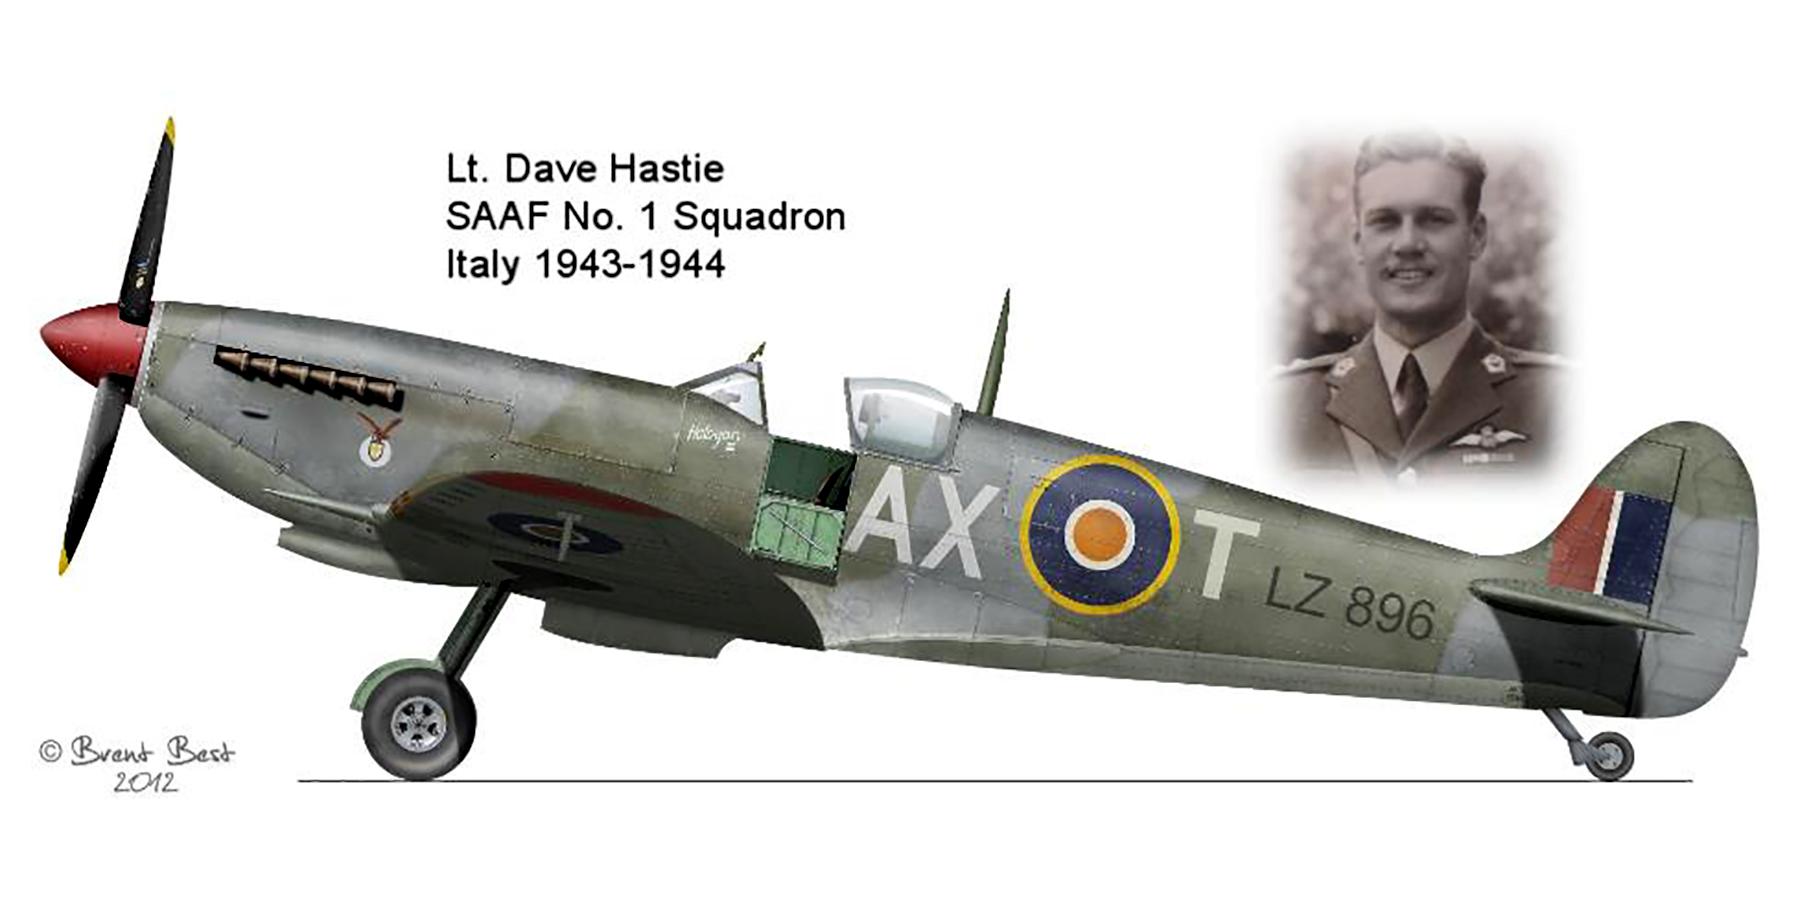 Spitfire MkIX SAAF 1Sqn AXT LZ896 Italy 1943 0A